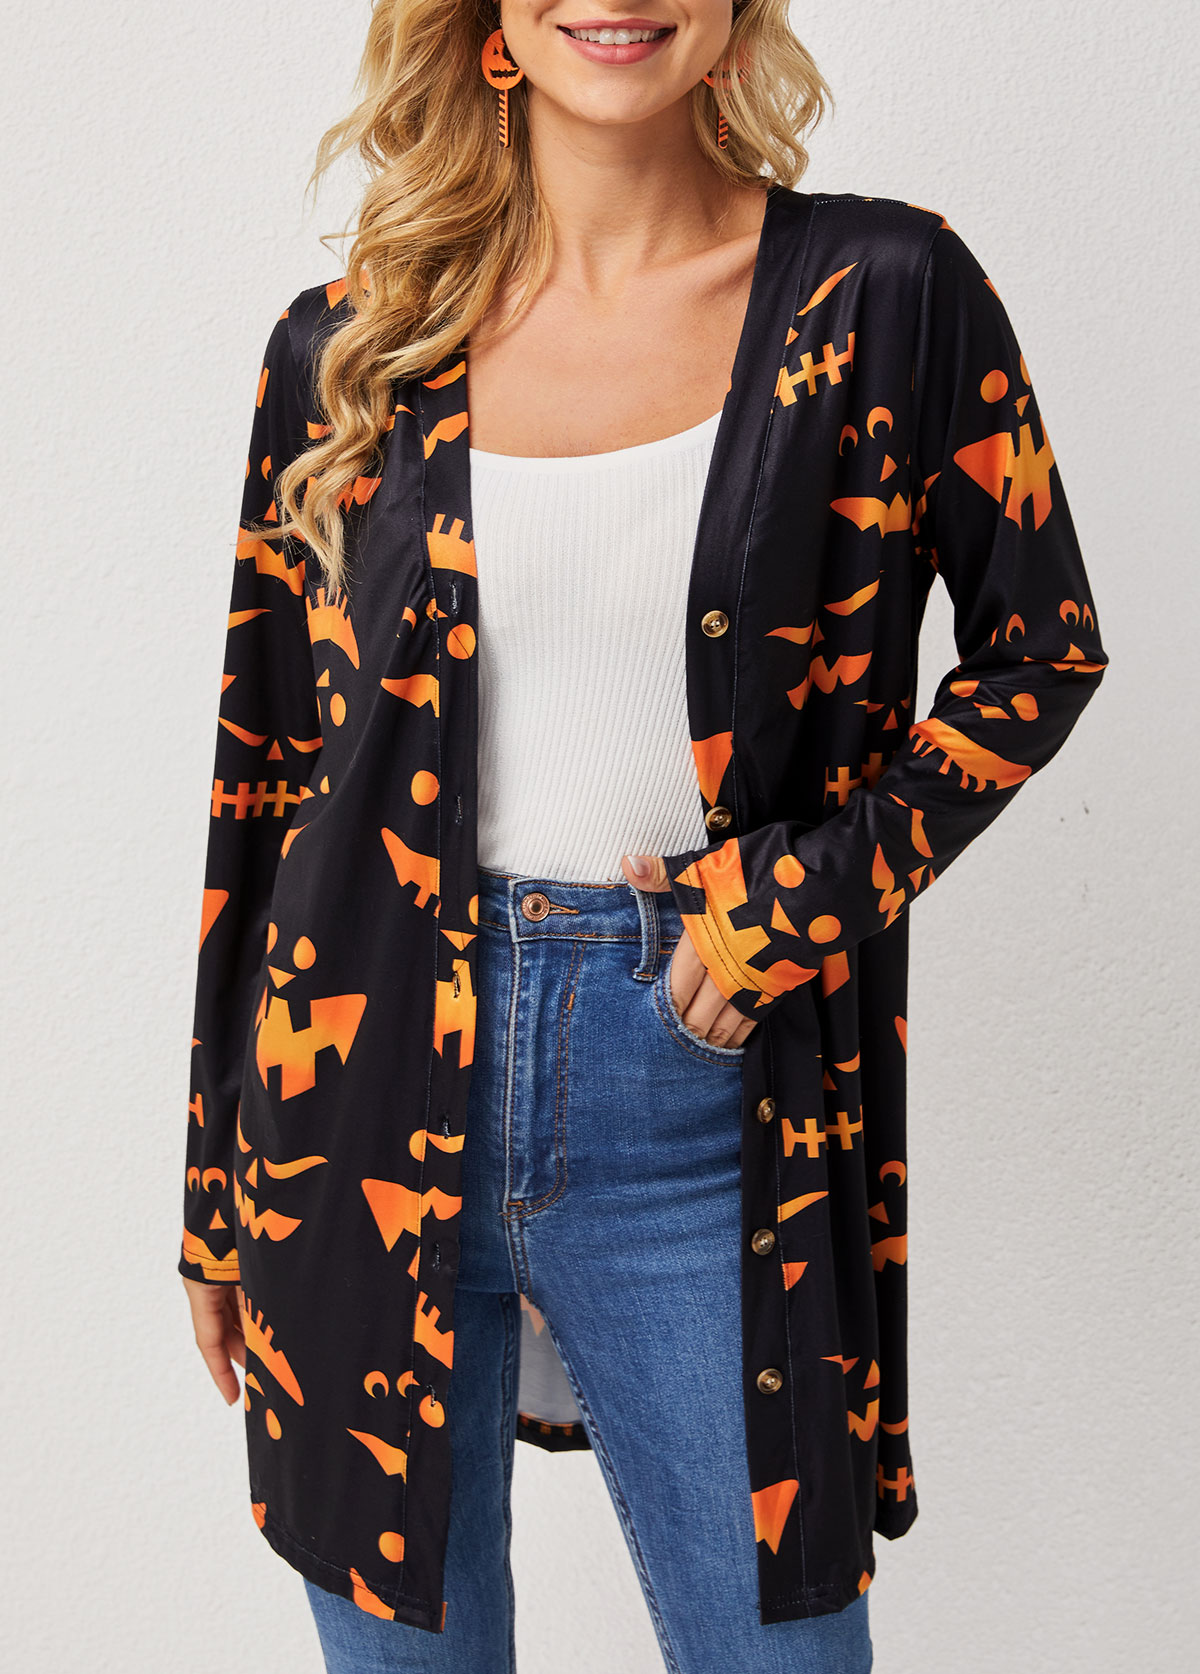 Halloween Pumpkin Print Long Sleeve Cardigan